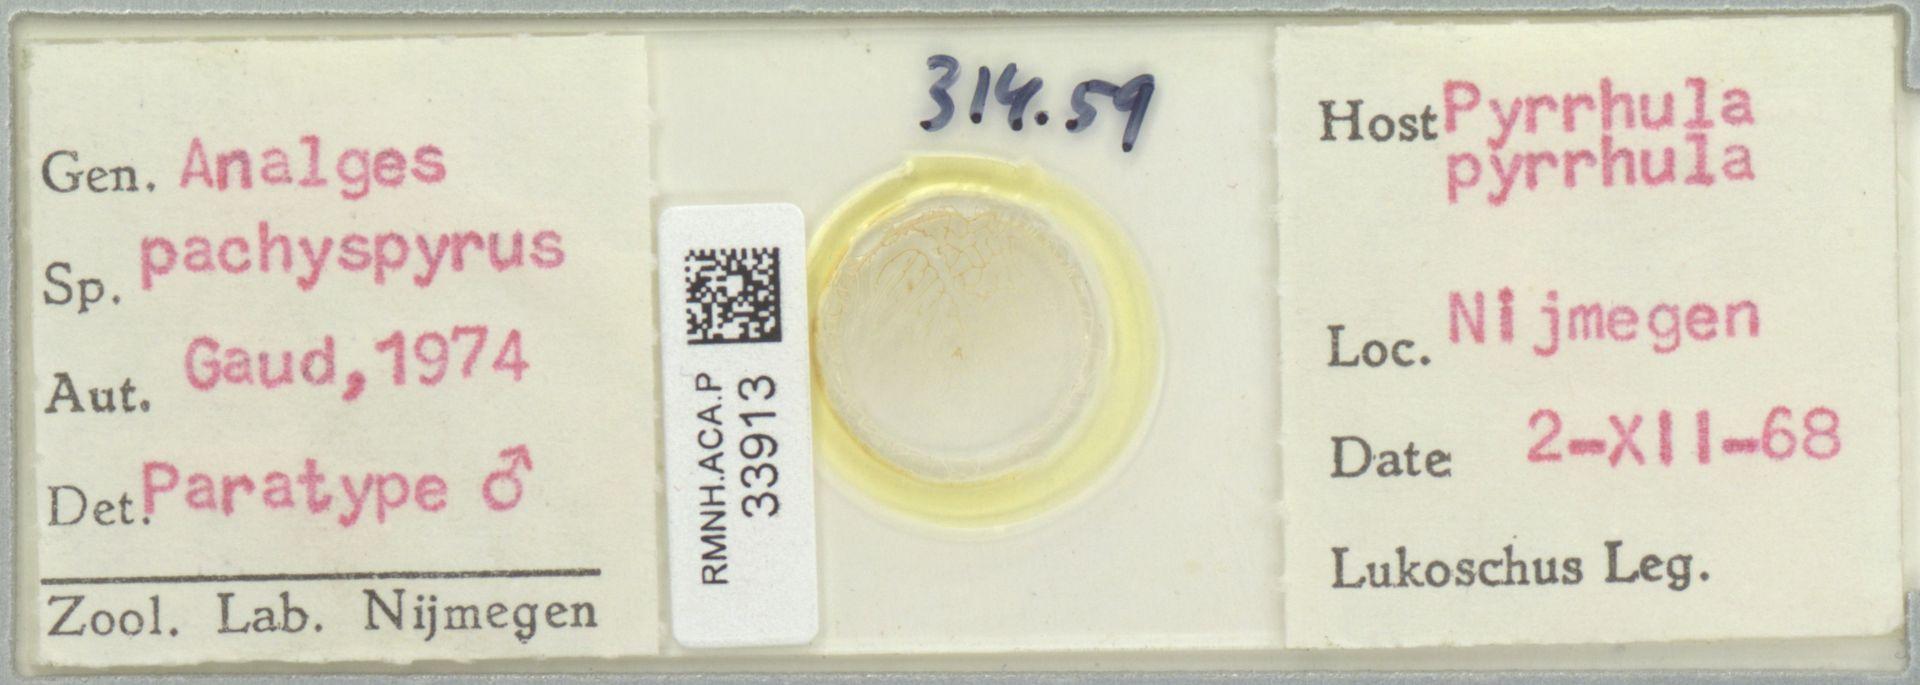 RMNH.ACA.P.33913 | Analges pachyspyrus Gaud, 1974